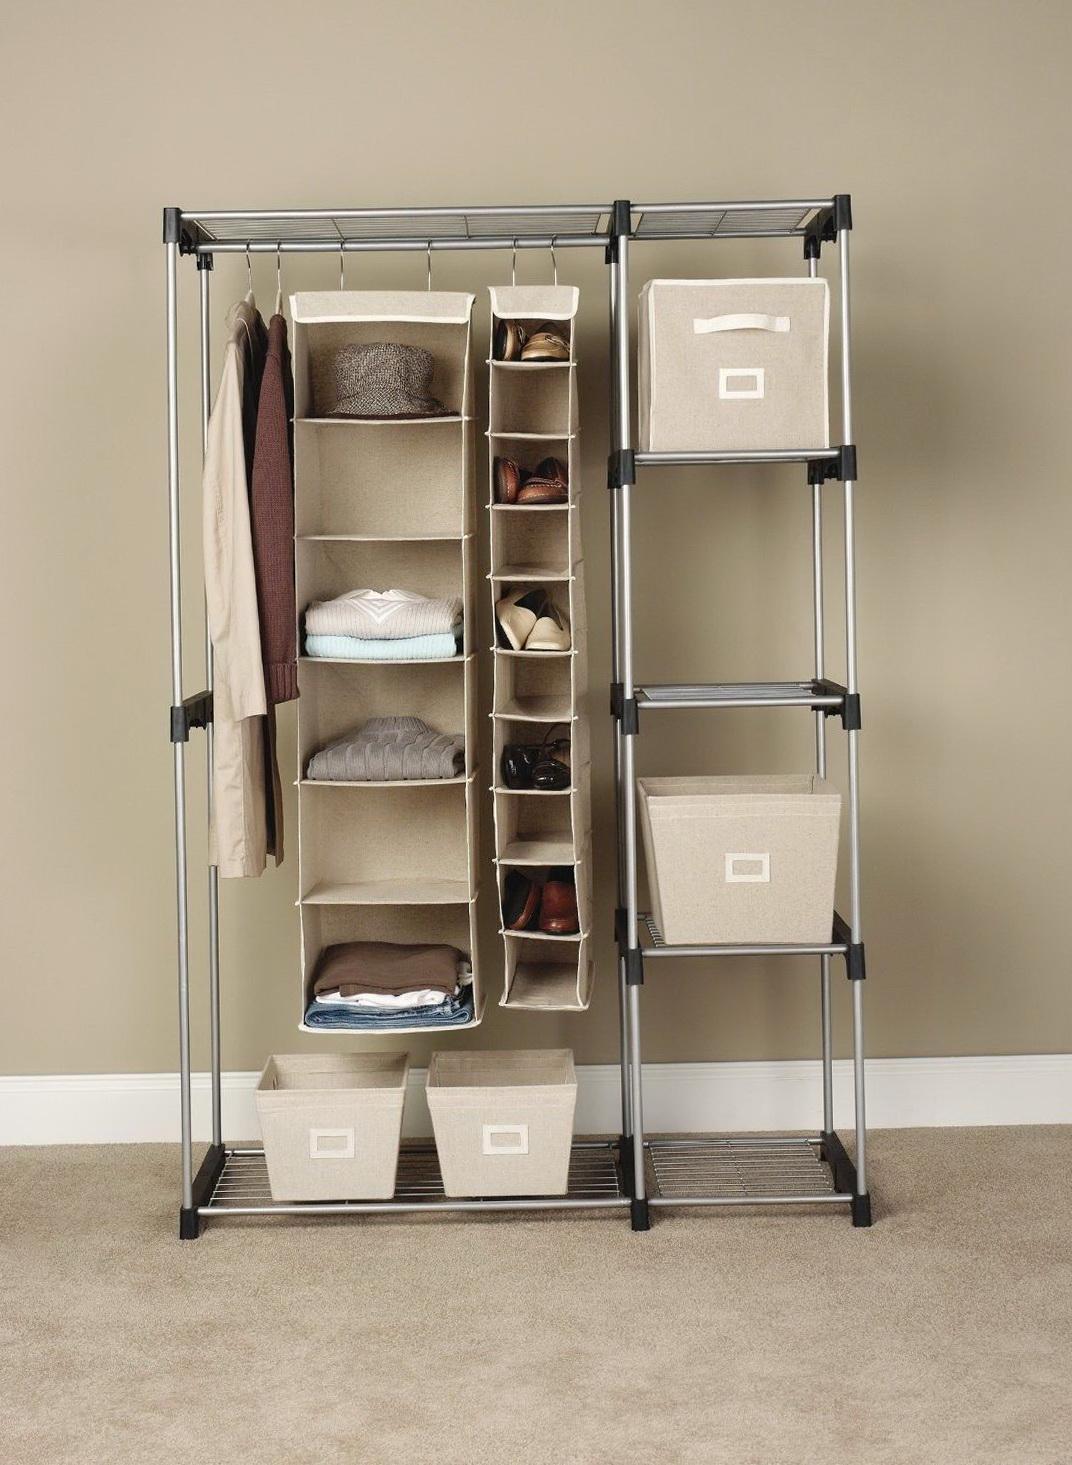 Fullsize Of Stand Alone Closet